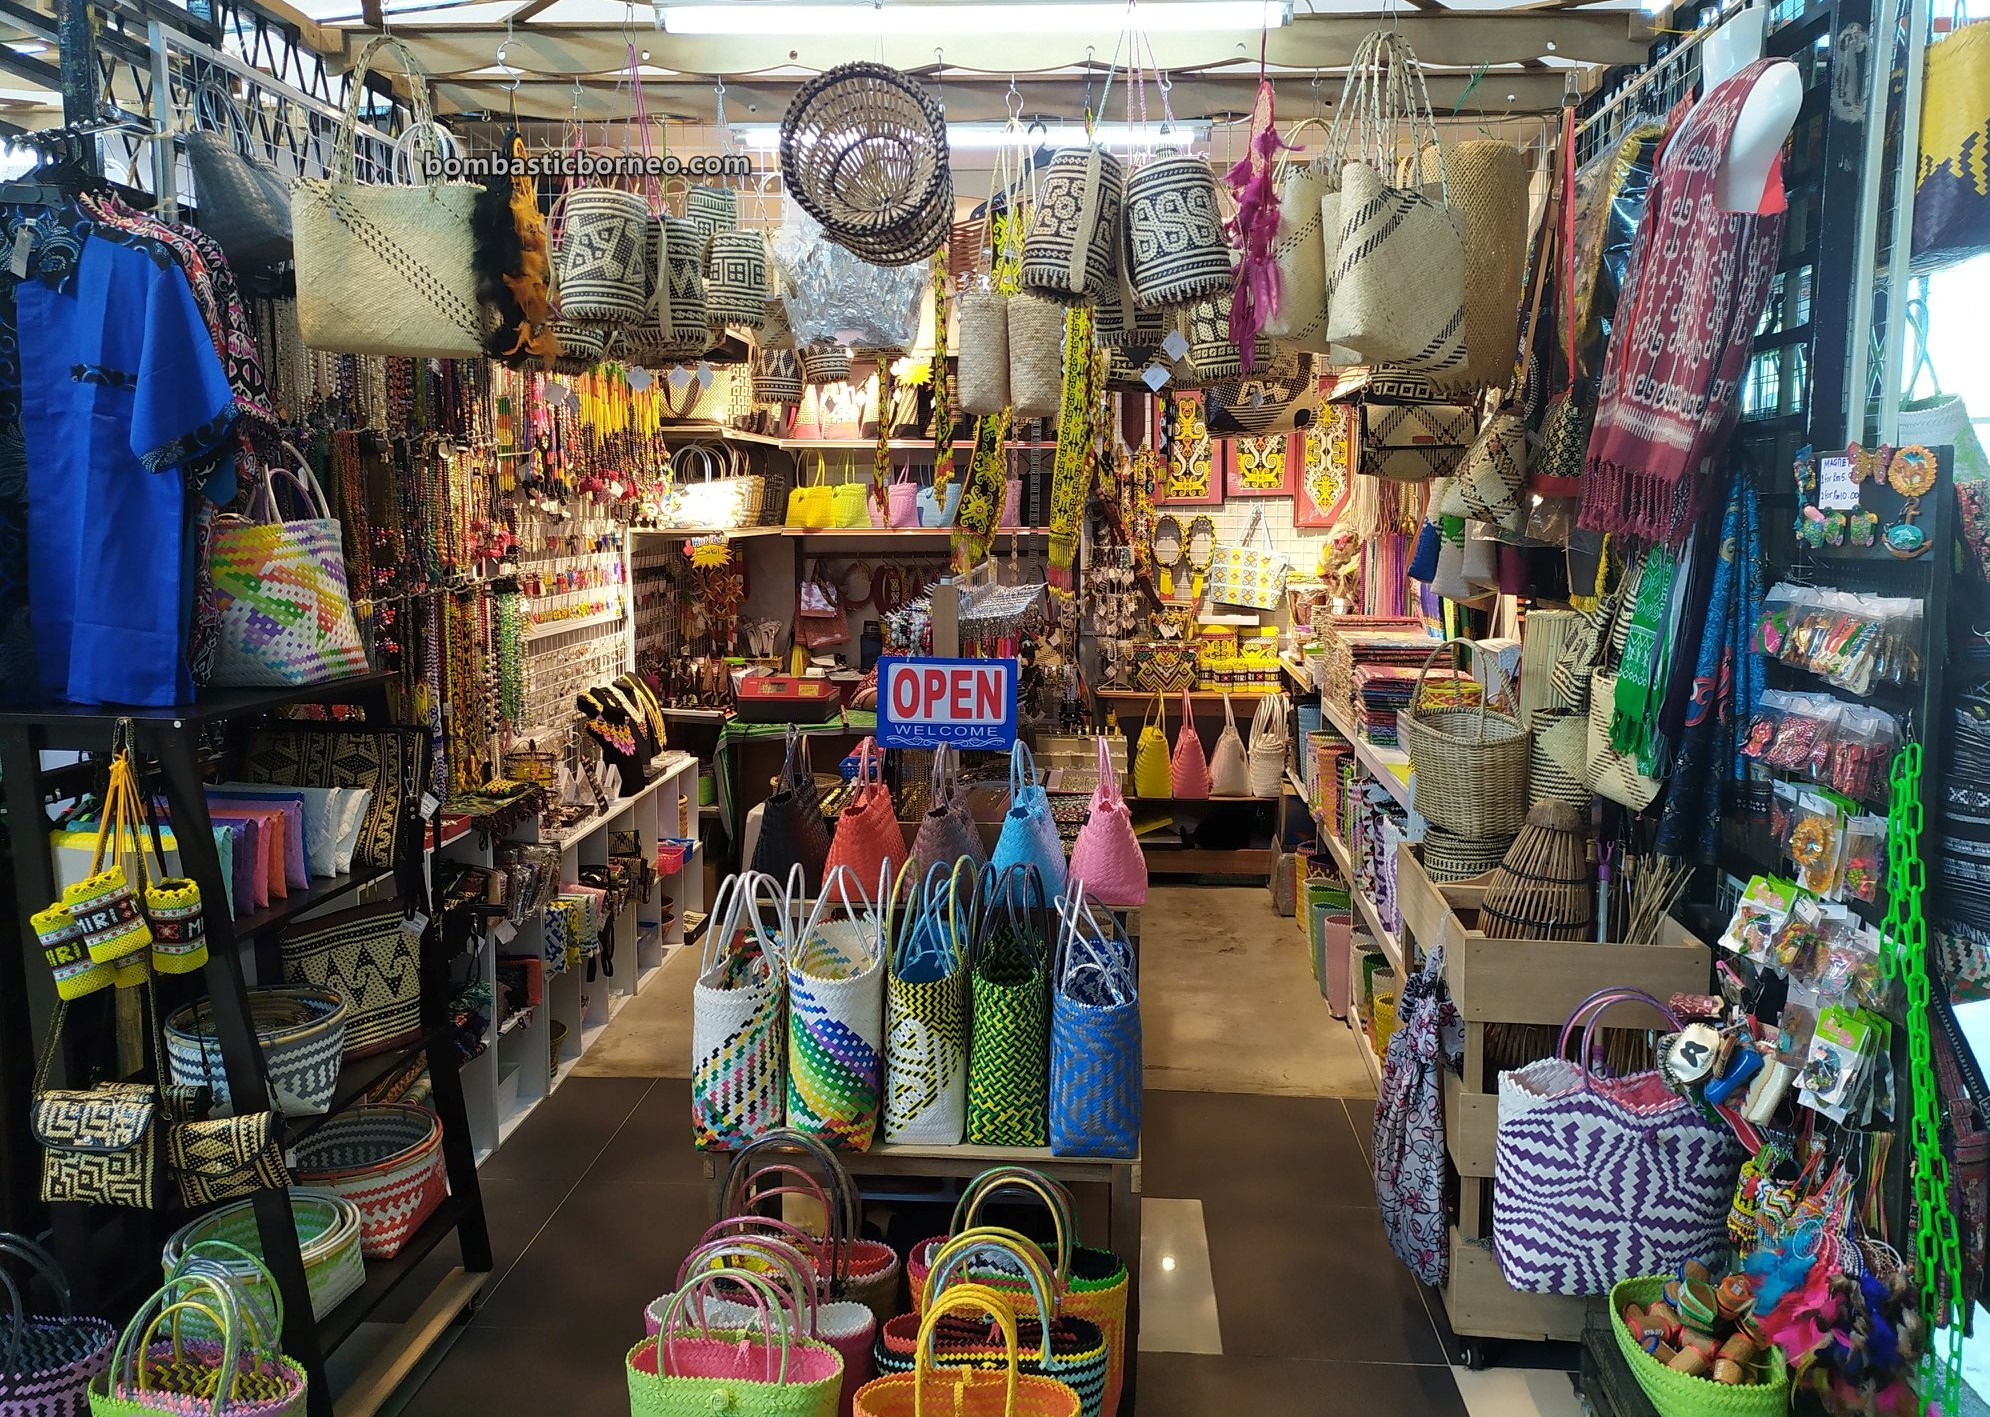 Miri handicraft centre, dayak motif, backpackers, destination, Discover Miri City, exploration, Malaysia, Tourism, tourist attraction, Travel guide, Borneo, Sarawak, Miri,